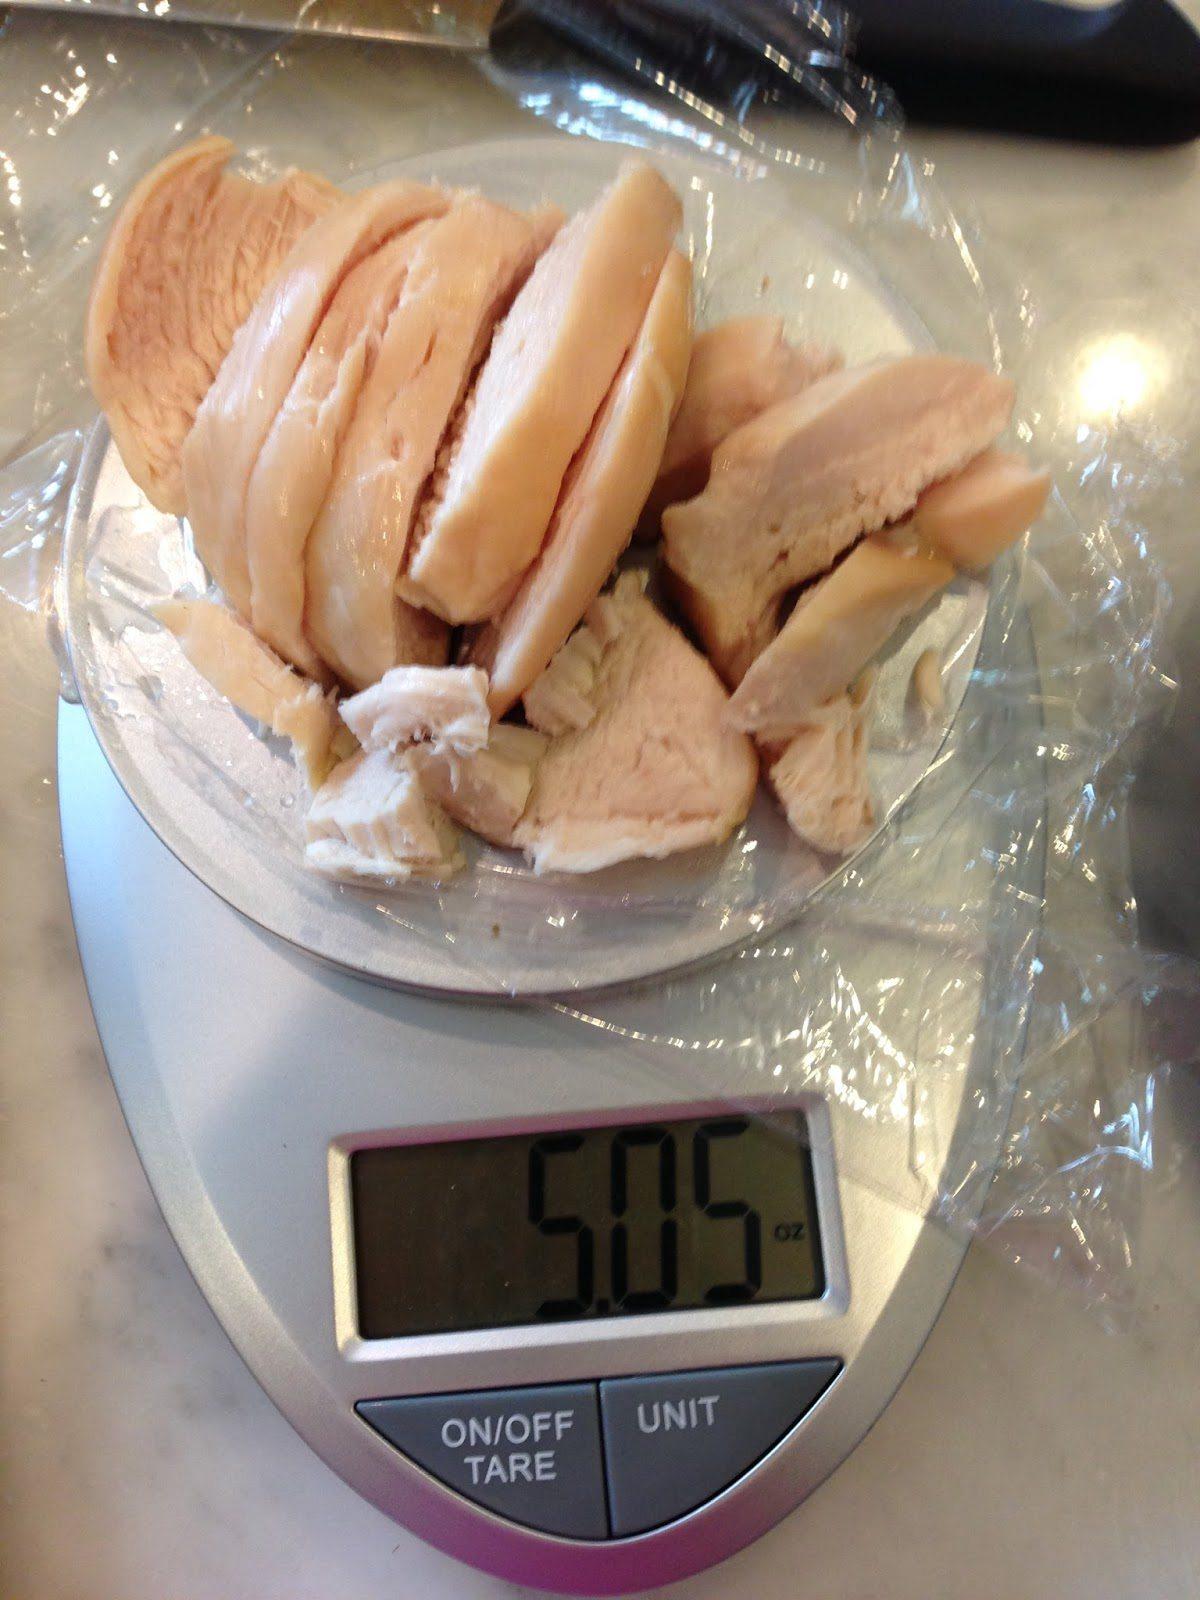 Bikini Contest Prep Meal Plan - Food Scale for Measuring Food